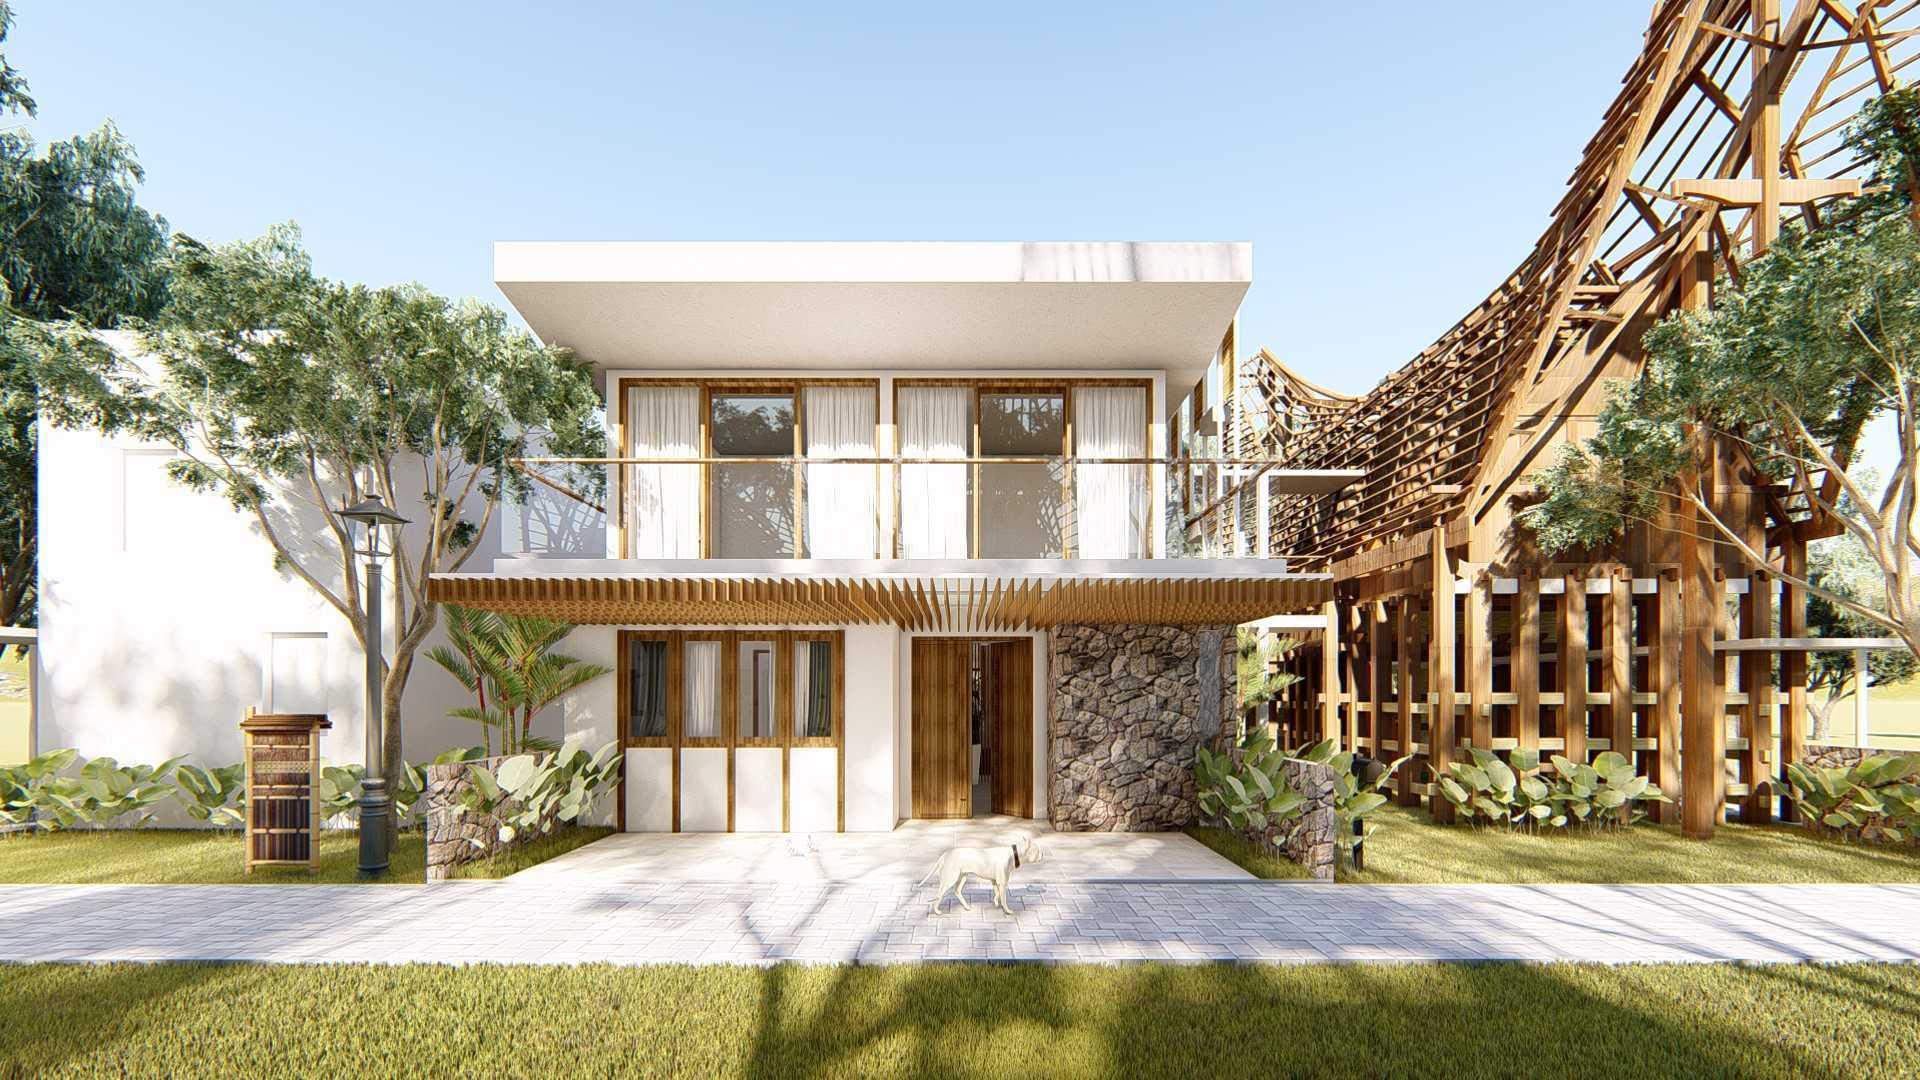 Guntur Haryadi Architecture Studio Tr Villa Nana' Nanggala, Nanggala, Kabupaten Toraja Utara, Sulawesi Selatan, Indonesia  Guntur-Haryadi-Architecture-Studio-Tr-Villa   65573